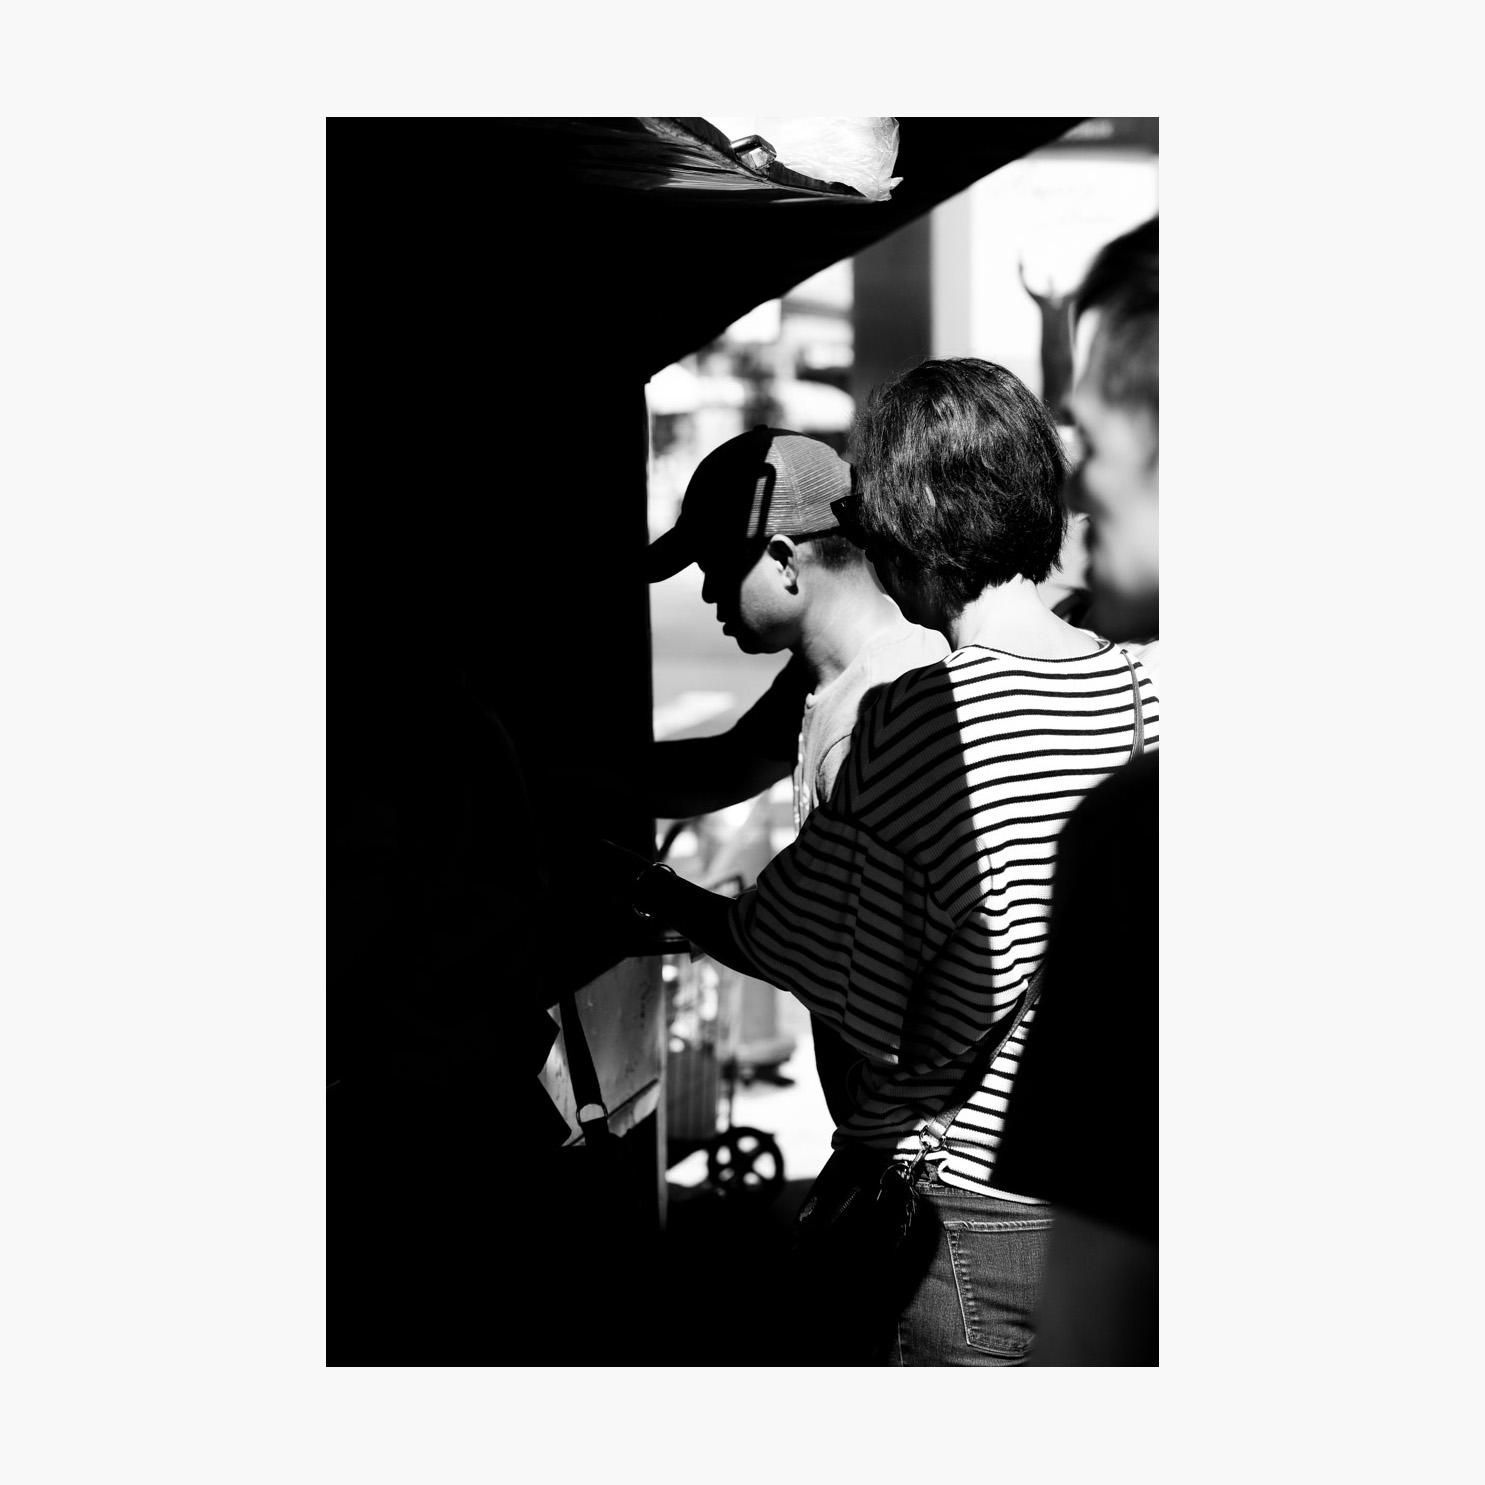 ©-2018-Harry-W-Edmonds-London-Photographer-Missing-the-Shot-PN04.jpg